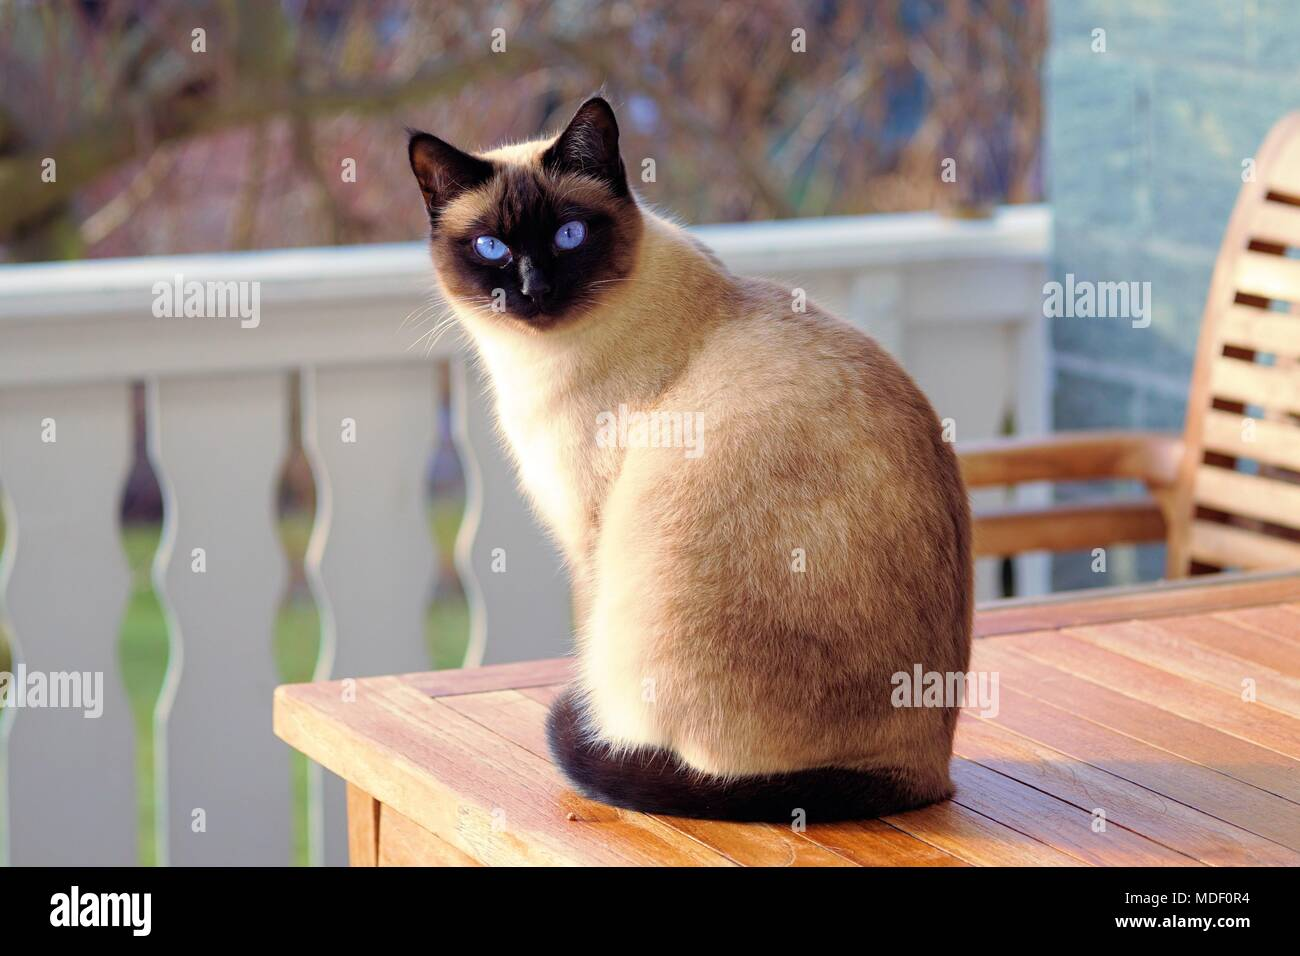 Domestic Cats - Stock Image